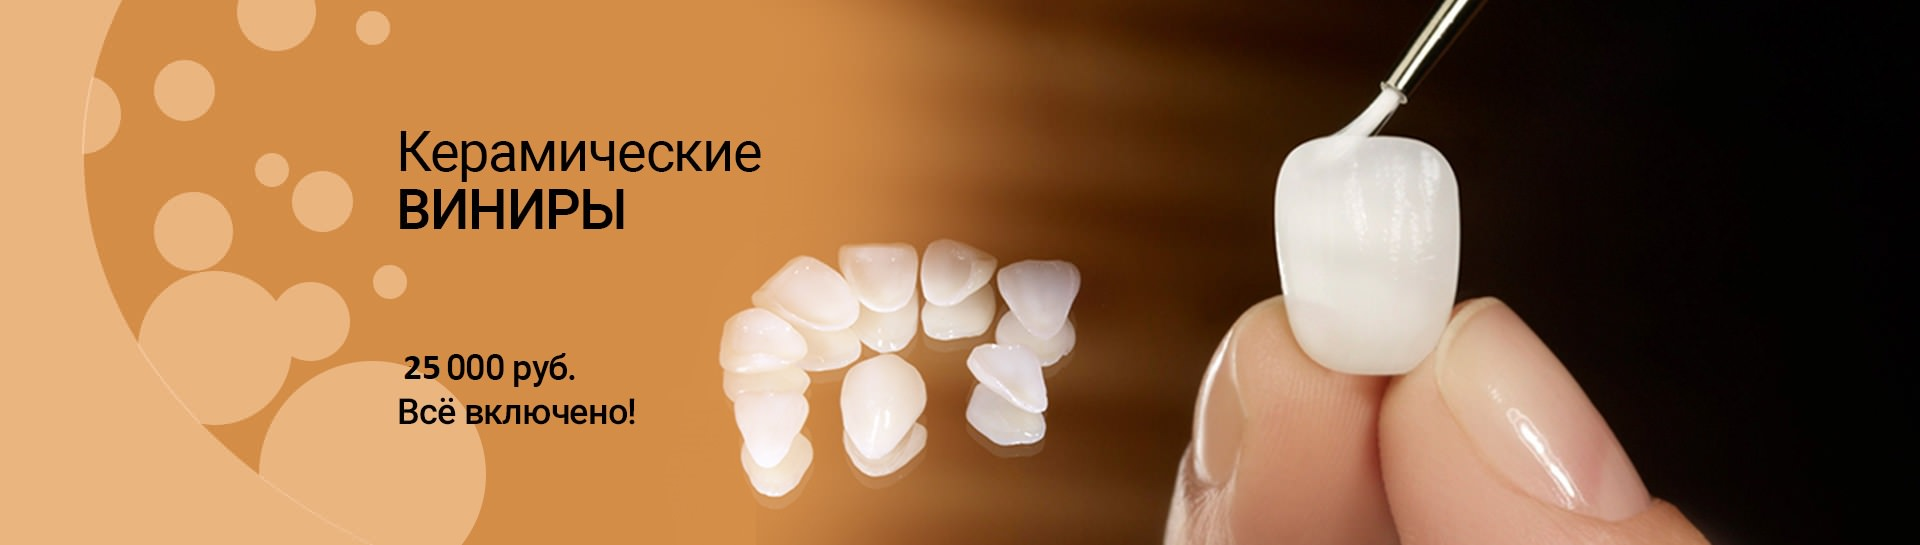 http://denta-maryino.ru/wp-content/uploads/vinirs-akcija.jpg 1x, http://denta-maryino.ru/wp-content/cache/thumb/a8/fd6be8cff989ea8_1320x545.jpg 1320w